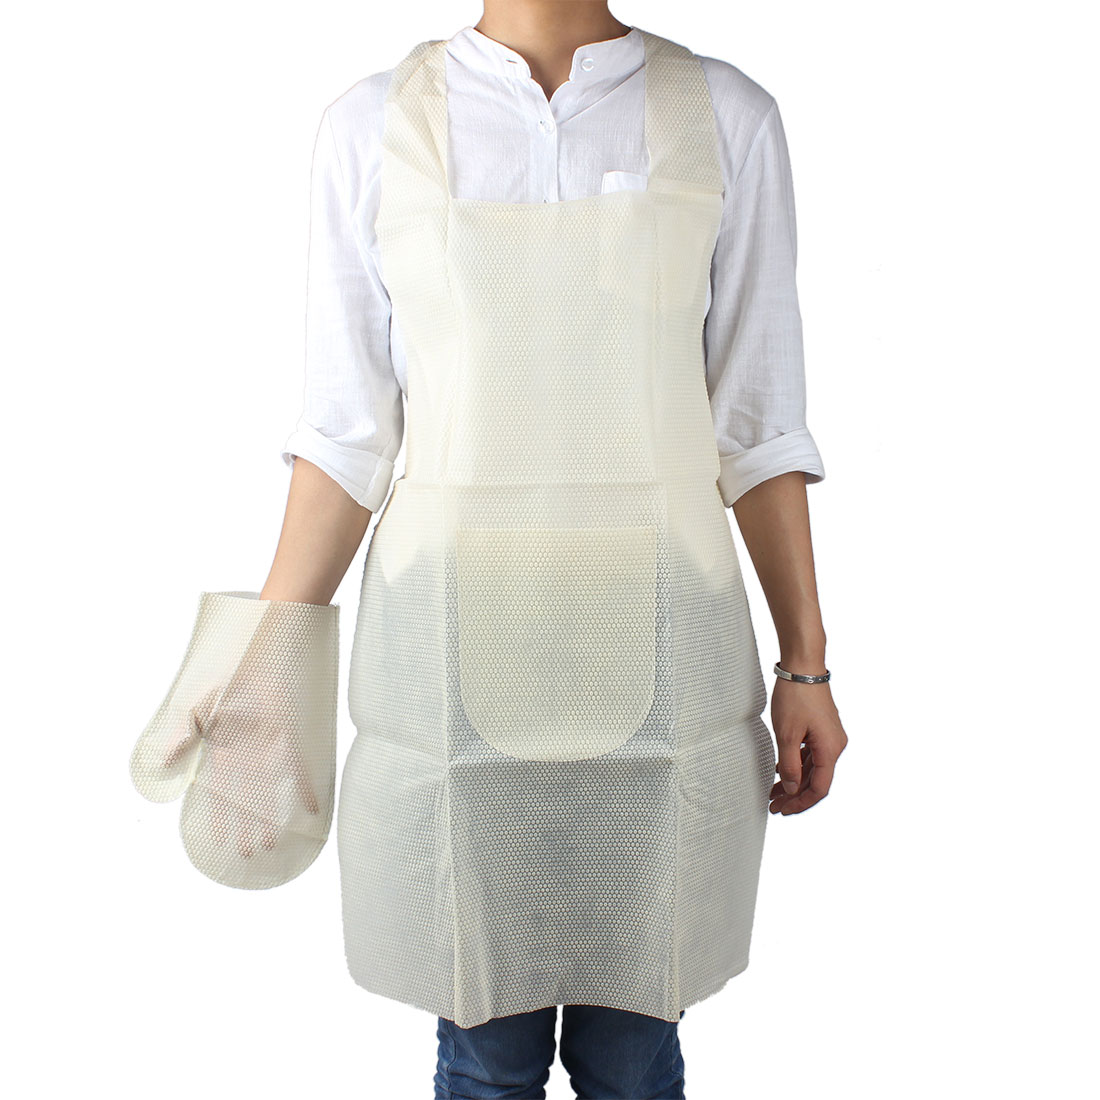 White apron dubai - Uxcell Product Name Dots Print Kitchen Cooking Neck Pocket Disposable Apron Self Tie Bib Dress Apron